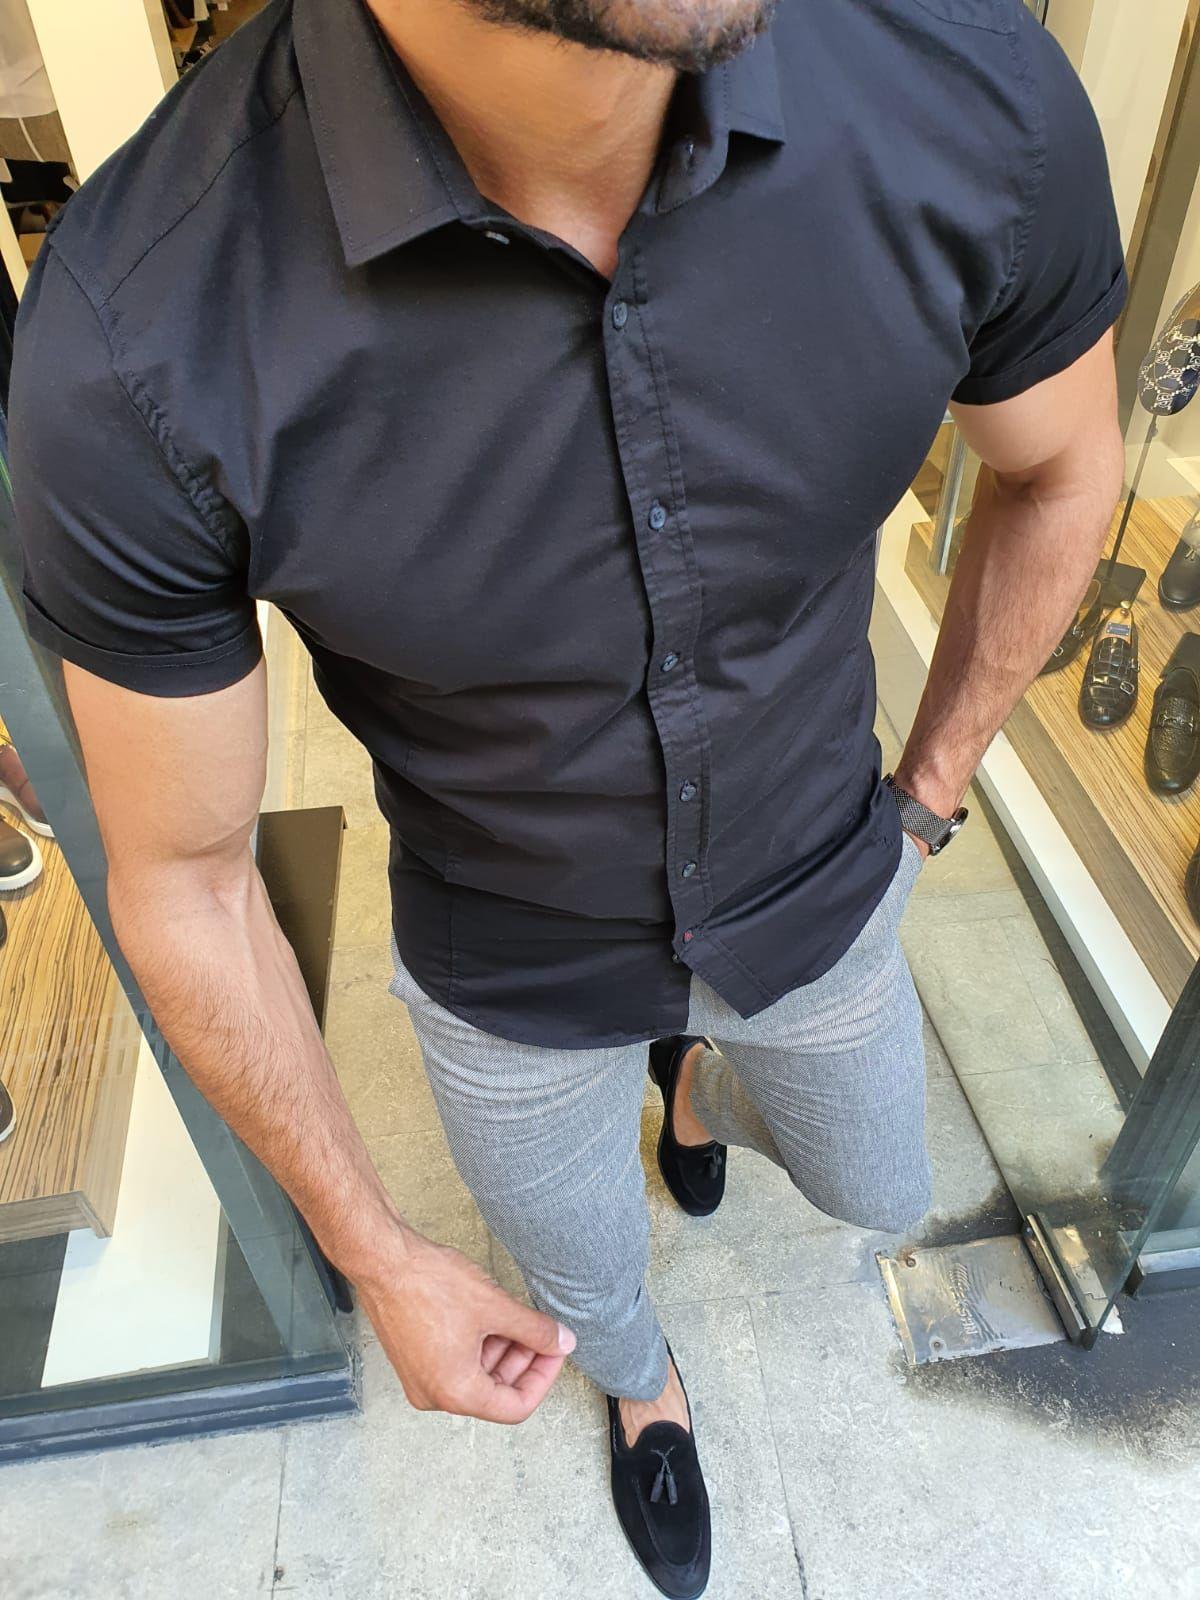 Gentwith Sparks Black Slim Fit Short Sleeve Shirt Gent With In 2021 Black Dress Shirt Men Mens Dressy Casual Outfit Mens Dressy Casual [ 1600 x 1200 Pixel ]